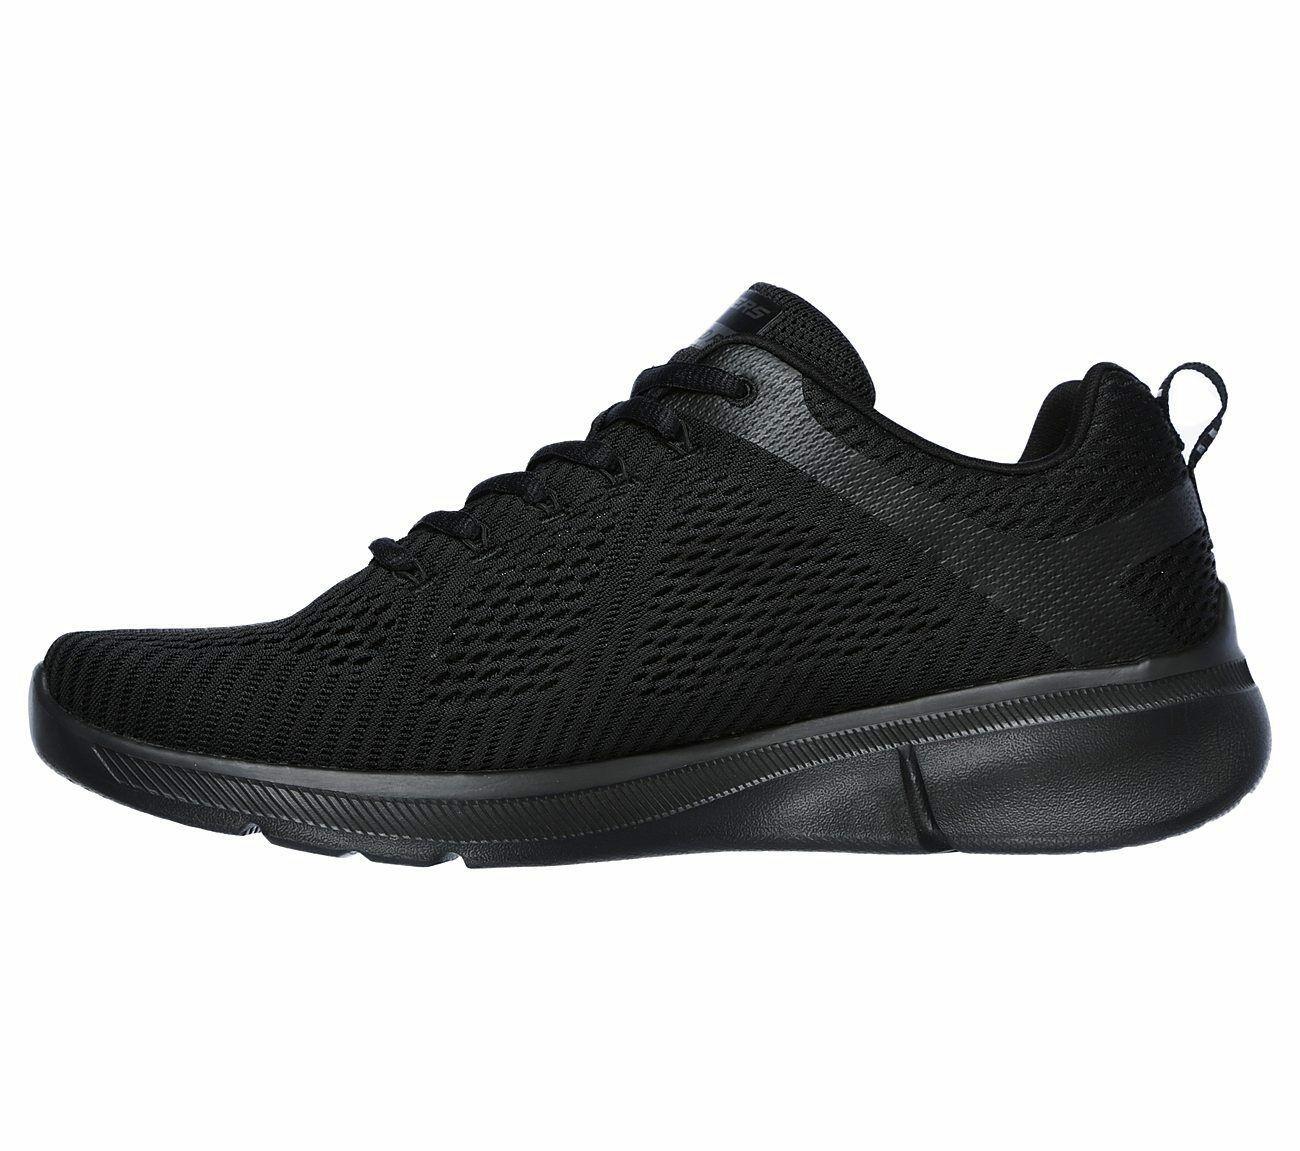 Skechers Black shoe Men Memory Foam Soft Mesh Train Sport Comfort Athletic 52927